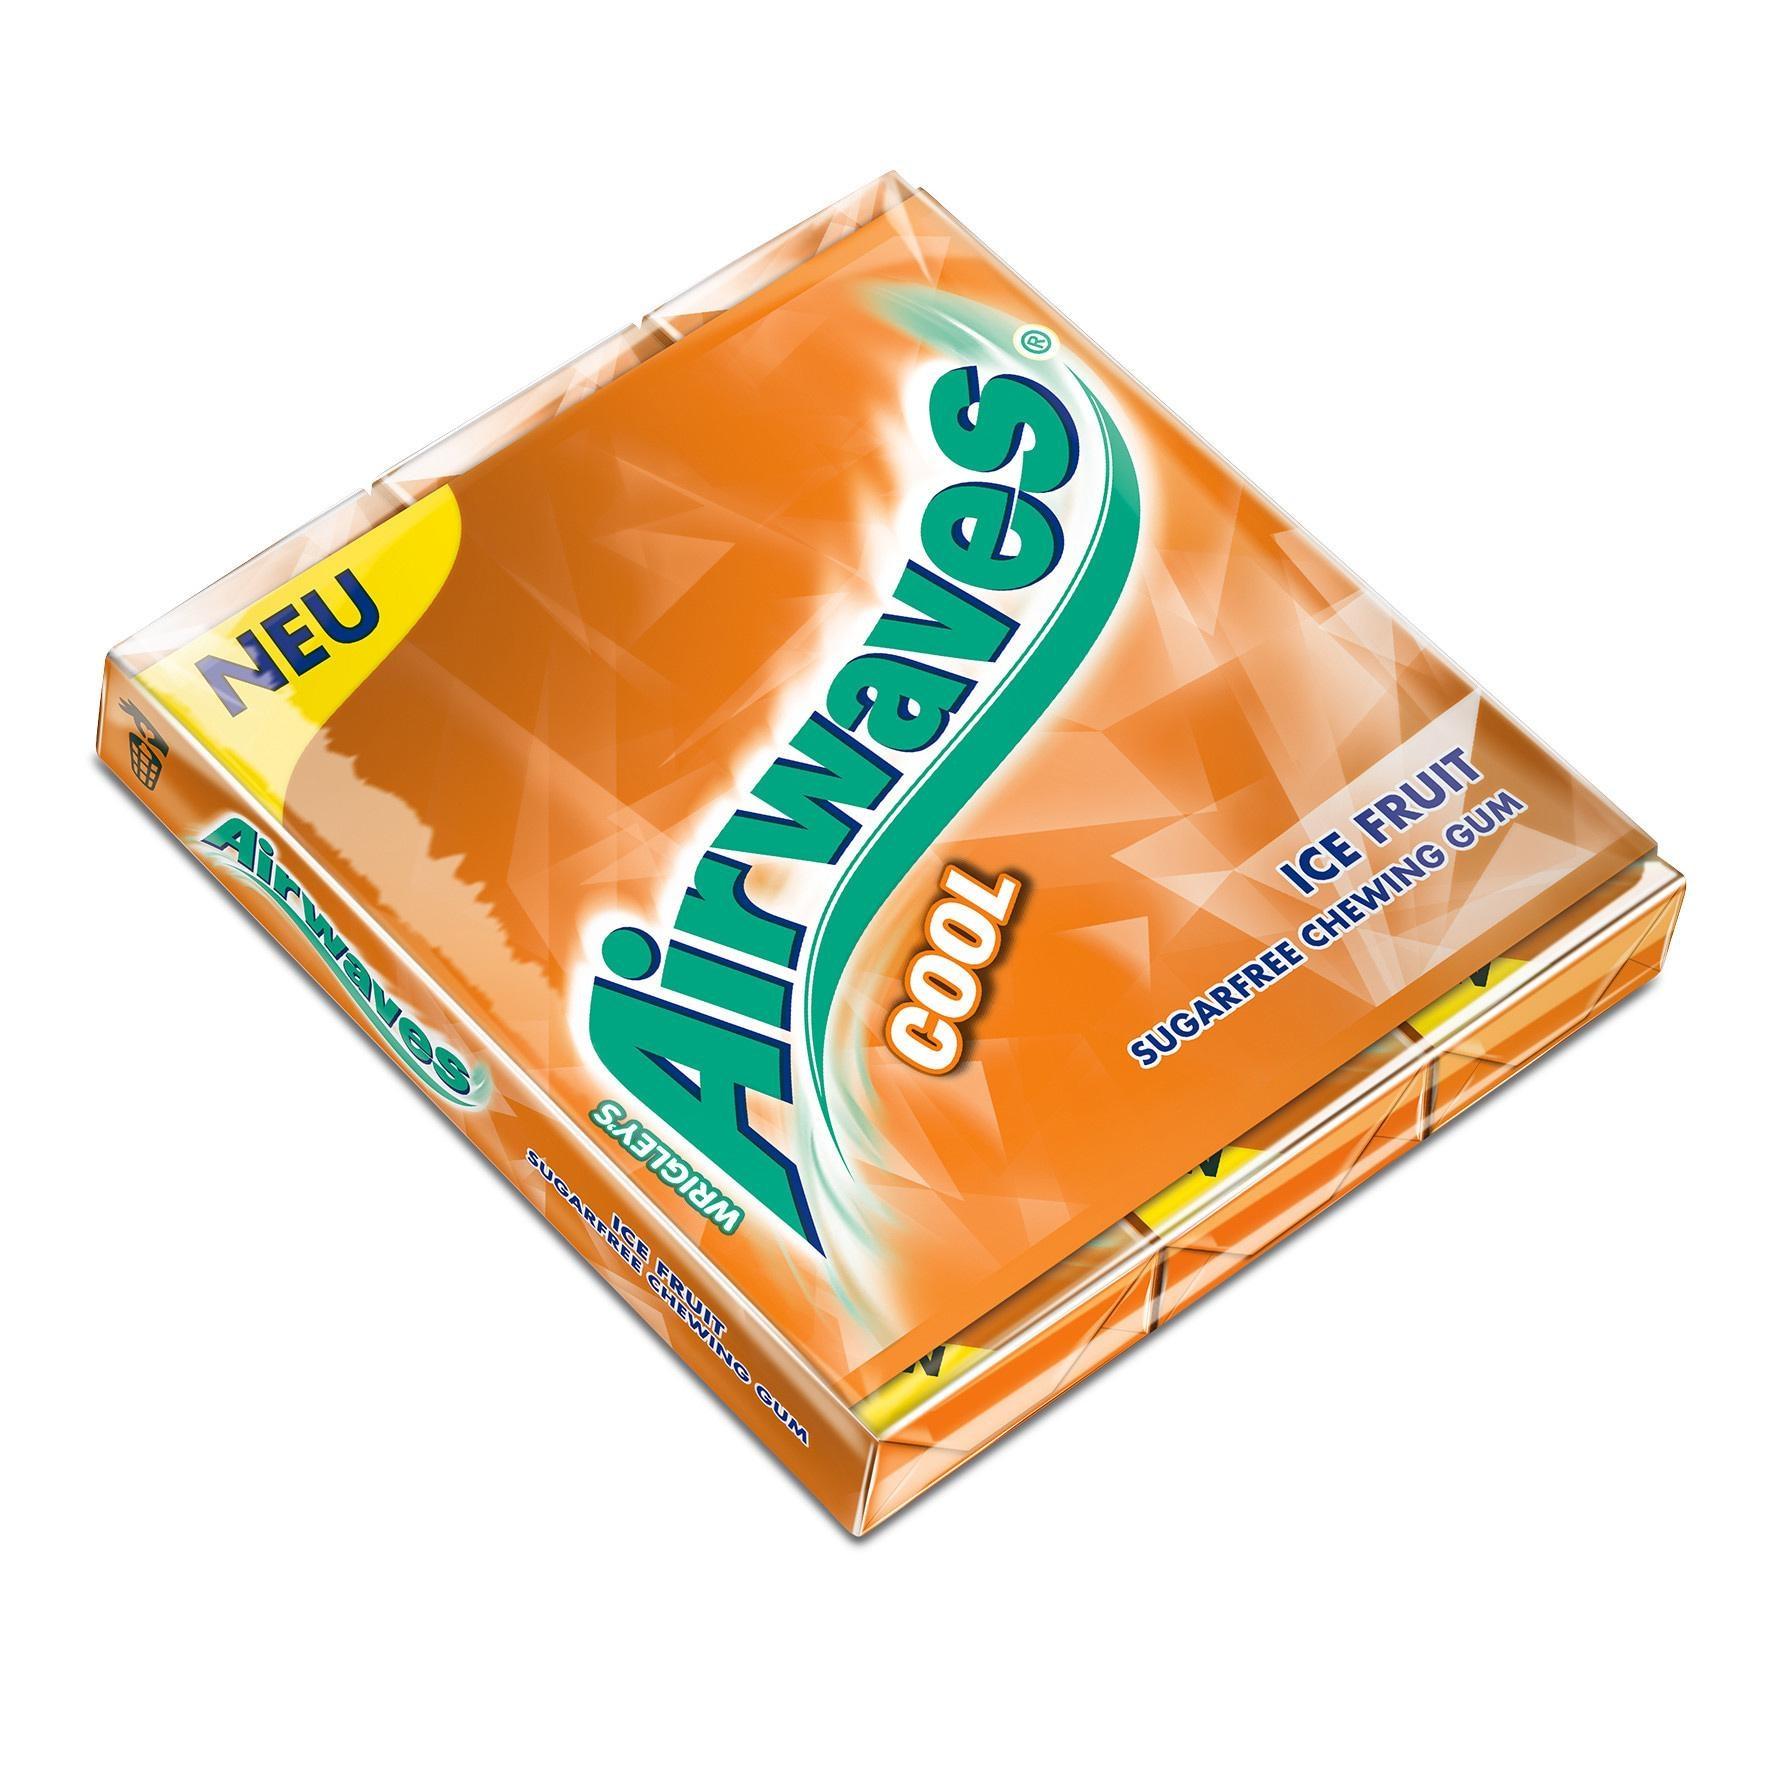 Wrigley's - Airwaves Cool Ice Fruit Kaugummi - 3x10St/48g